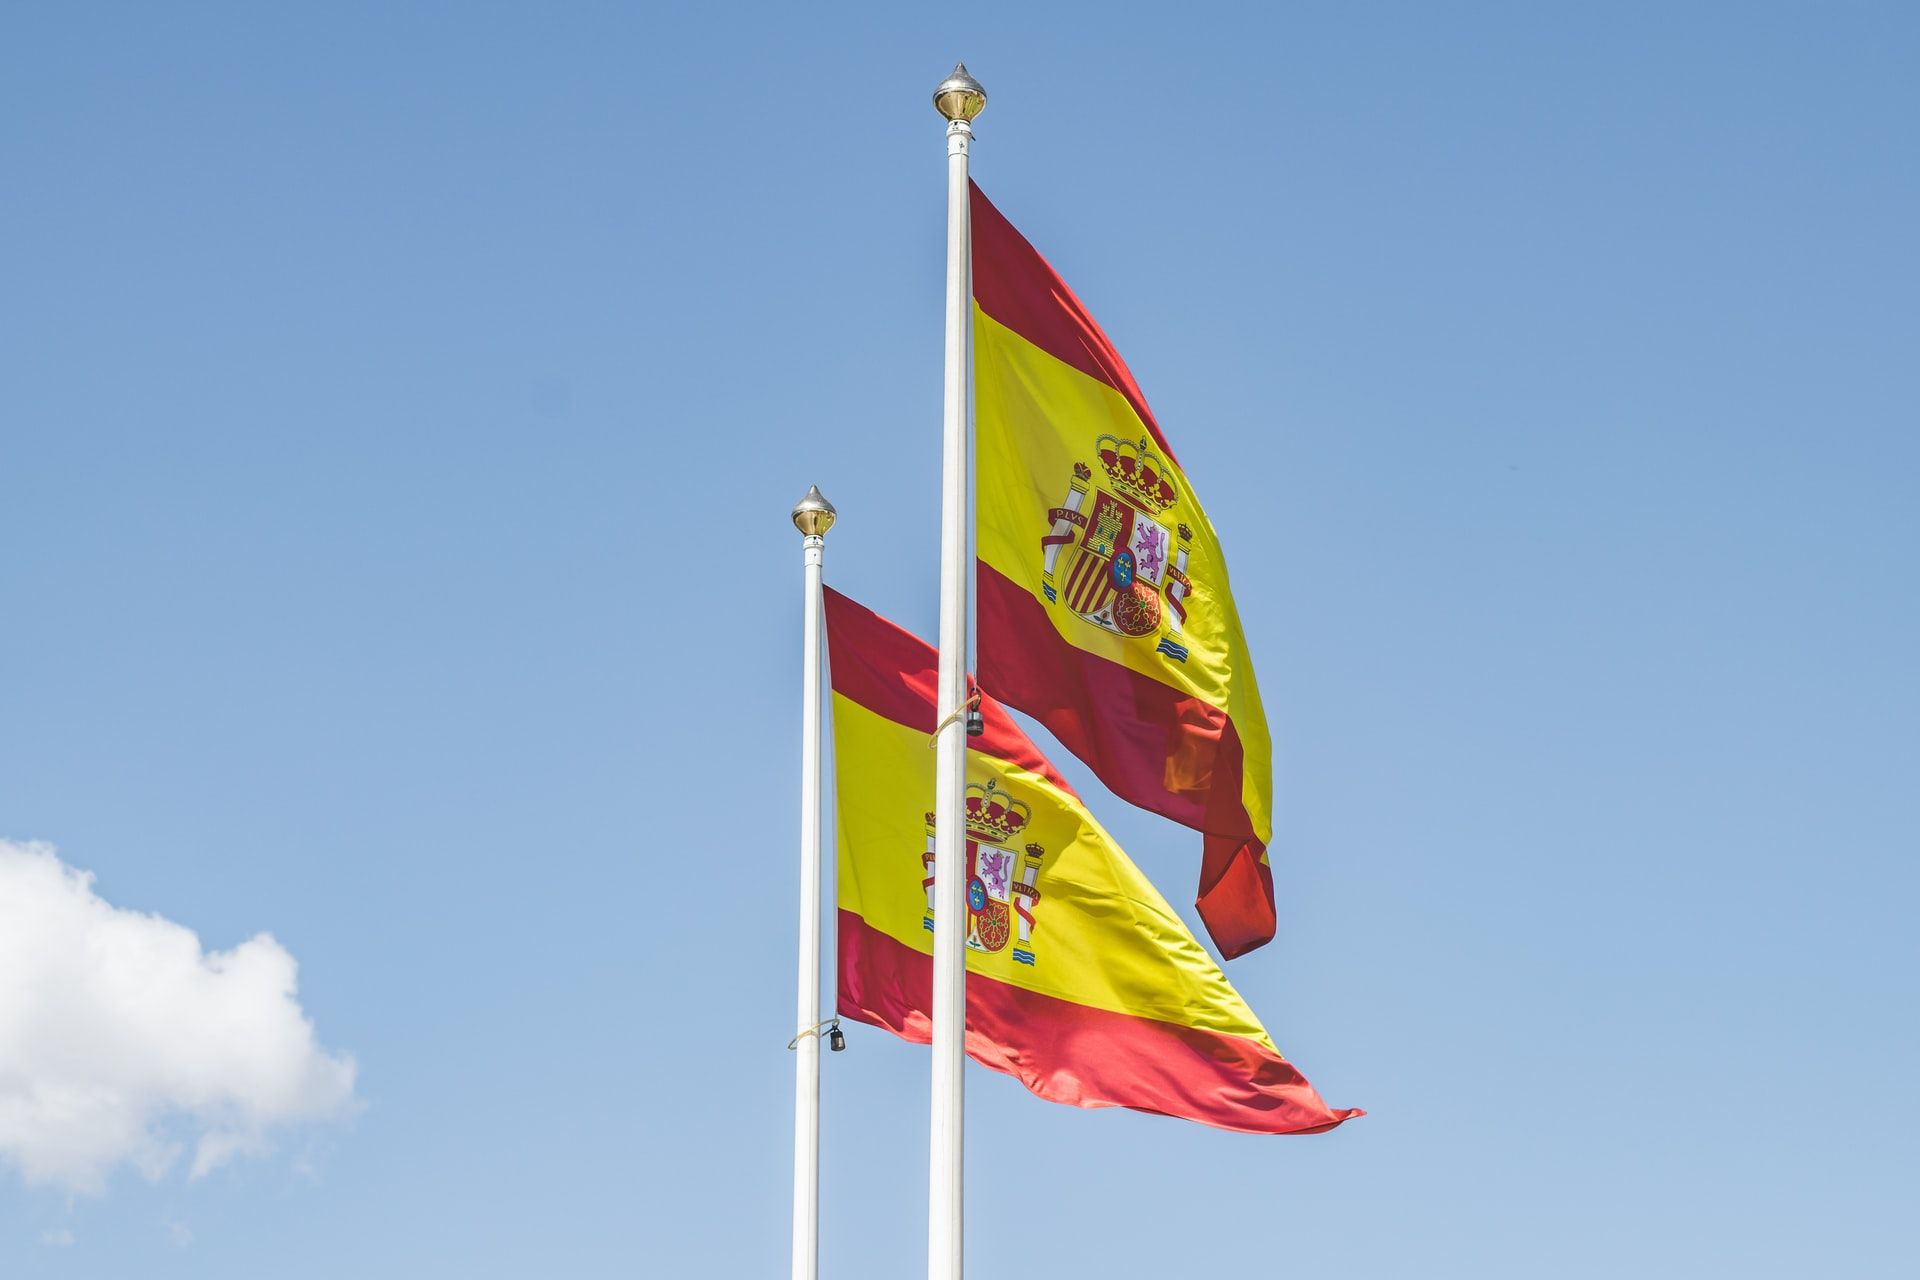 Regulador de valores de España inicia consulta pública con respecto a la regulación publicitaria vinculada a Bitcoin y las criptomonedas